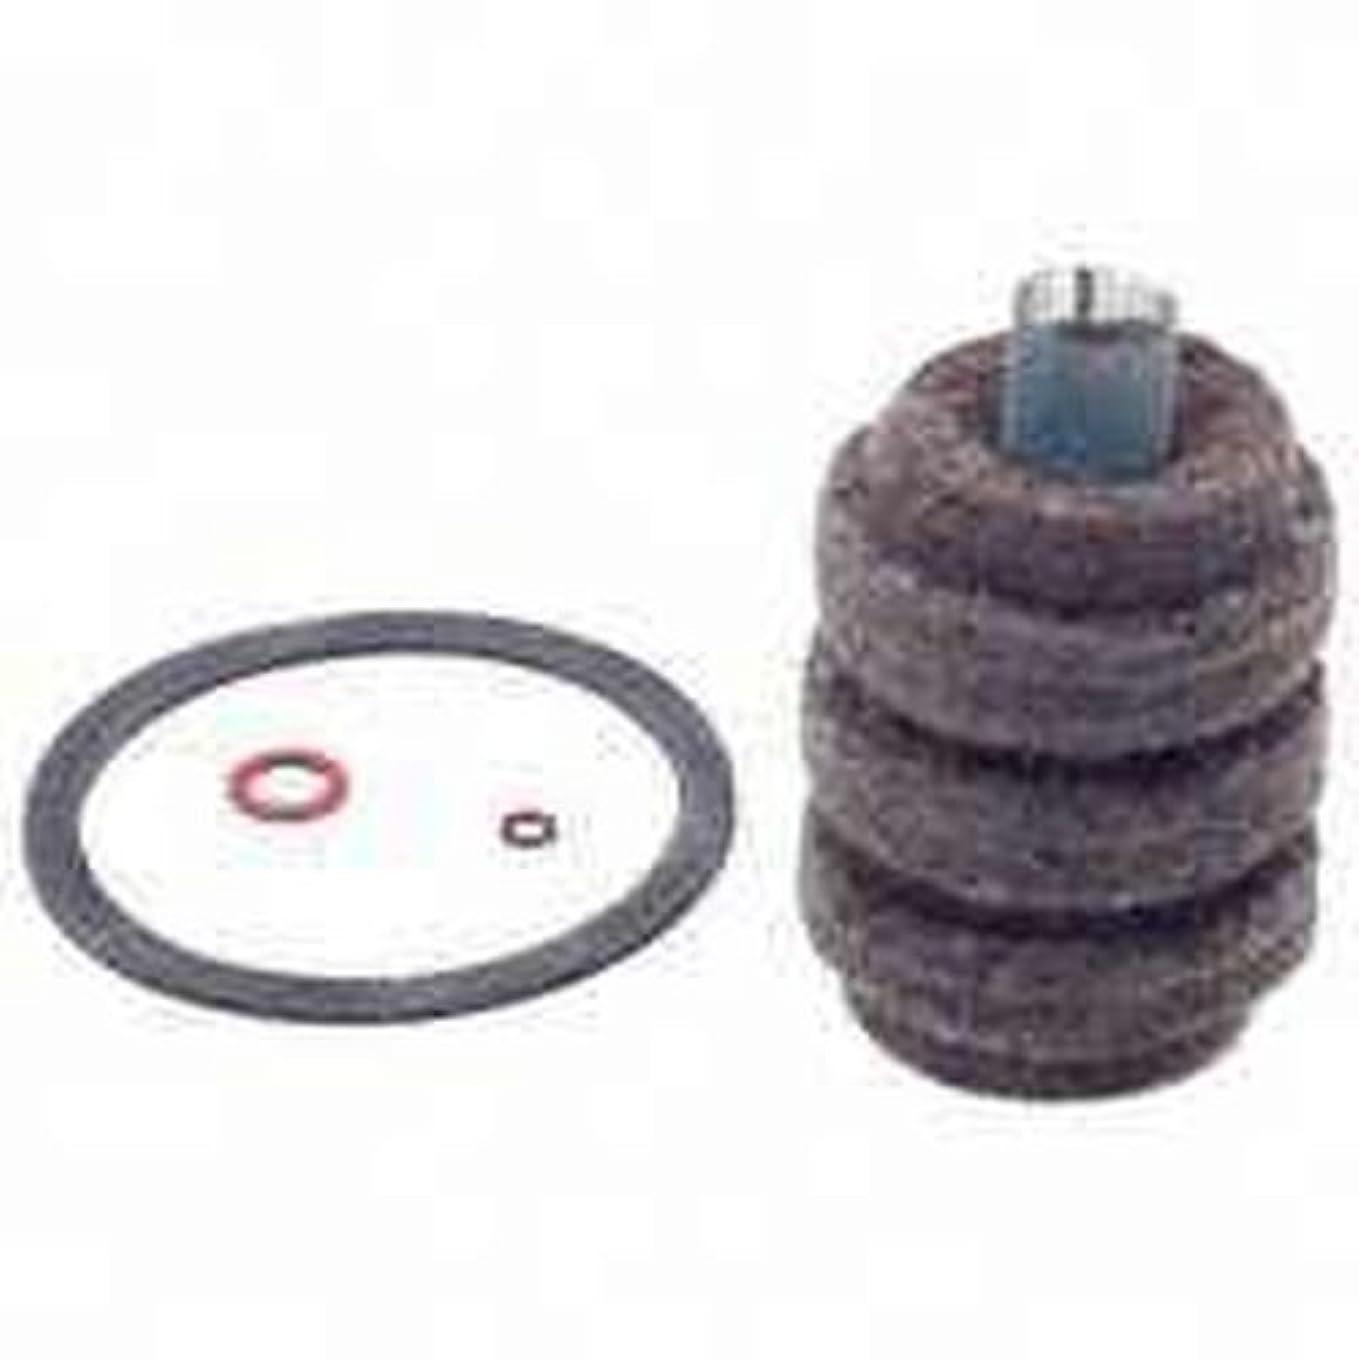 New Lot 6 General 1a-30 Fuel Oil Heat Filters Cartridge nh8271785592899